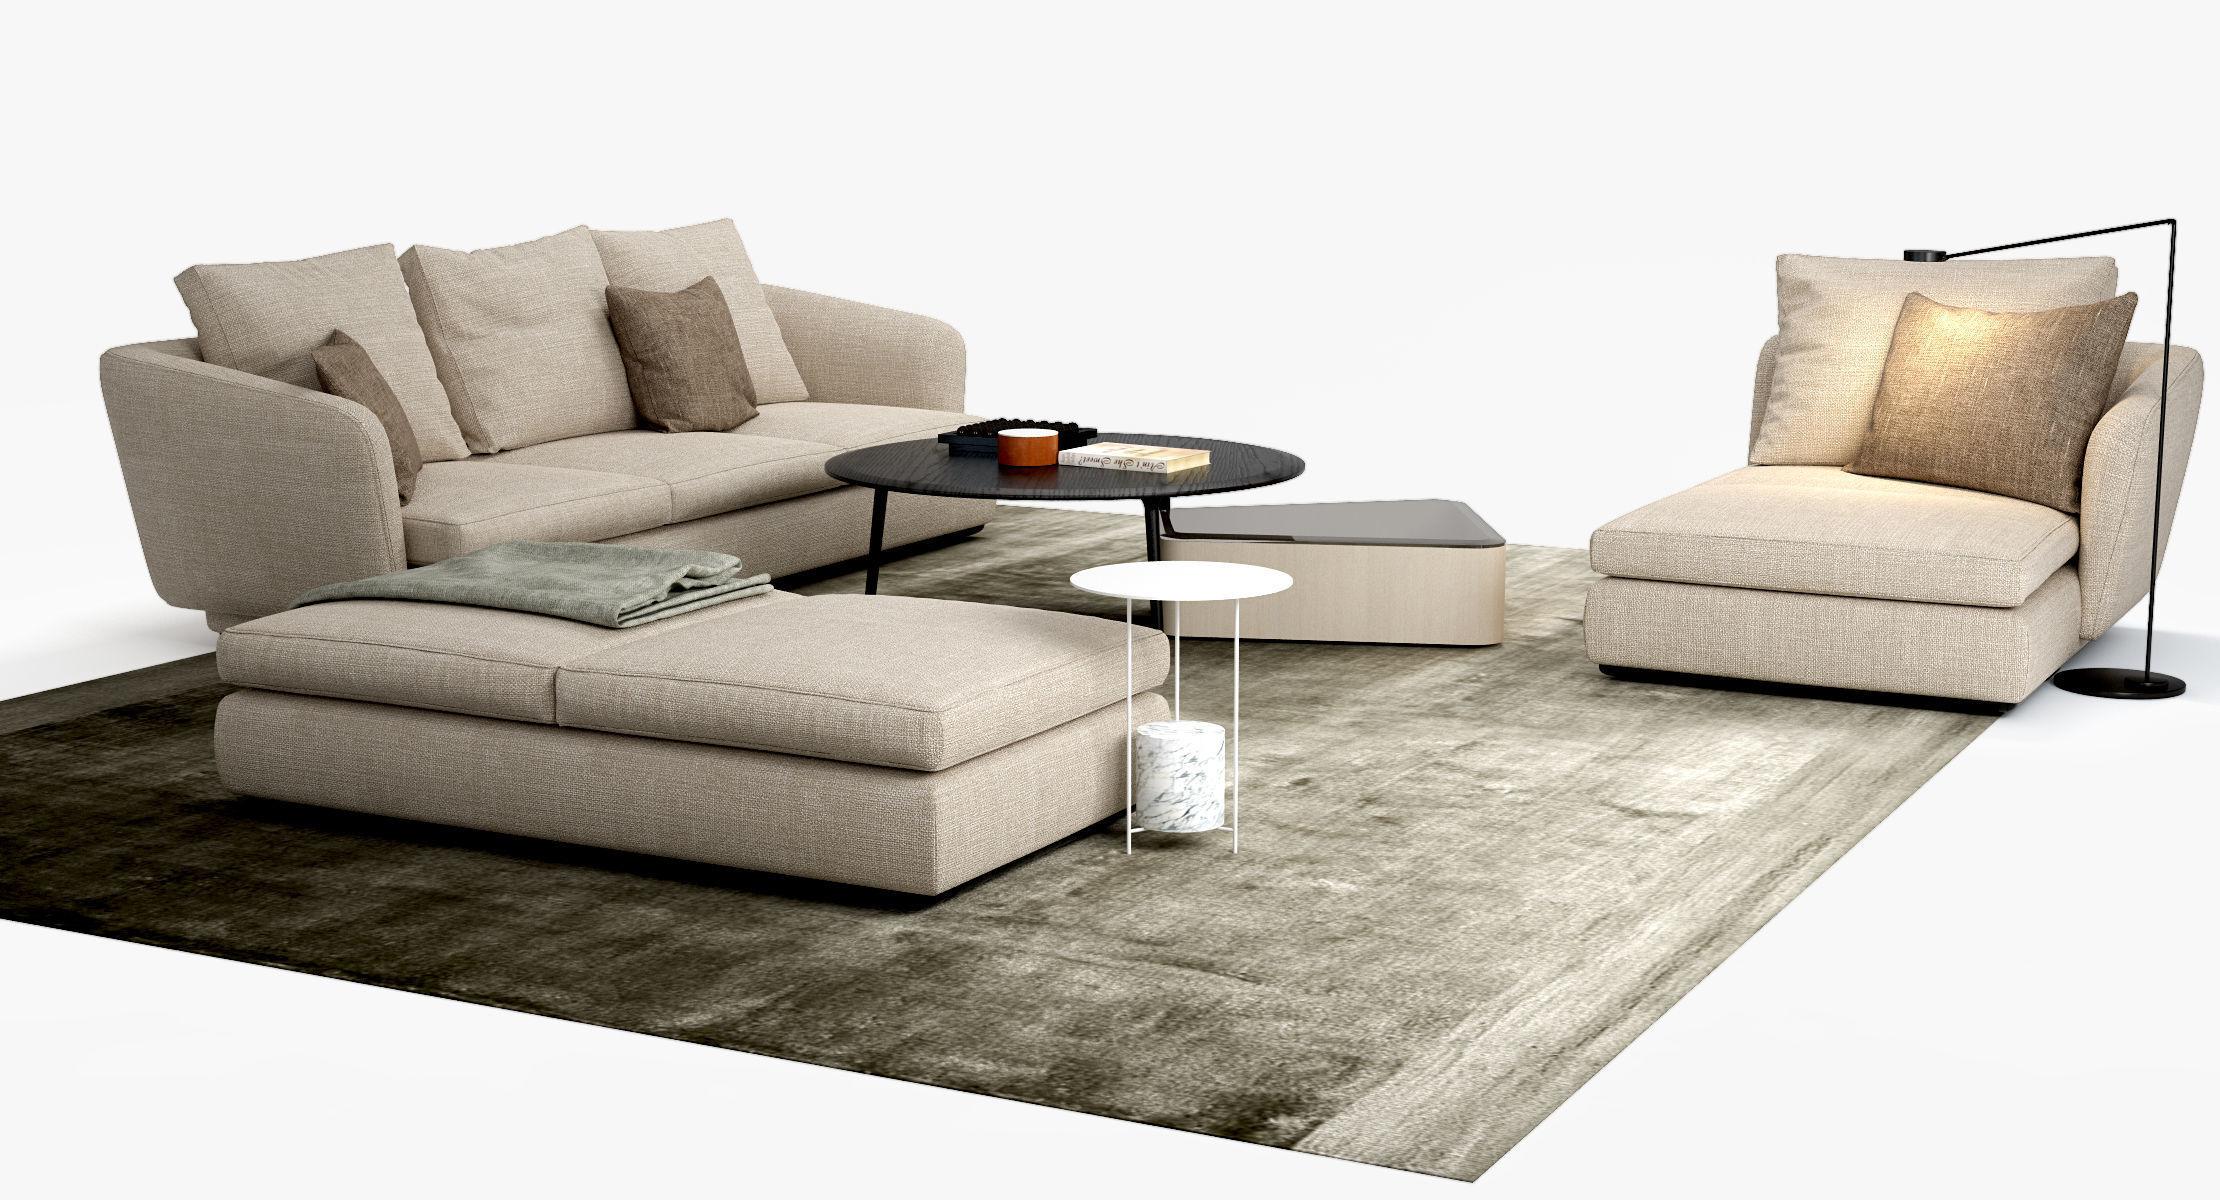 Molteni C Sloane Sofa Belsize Table Set